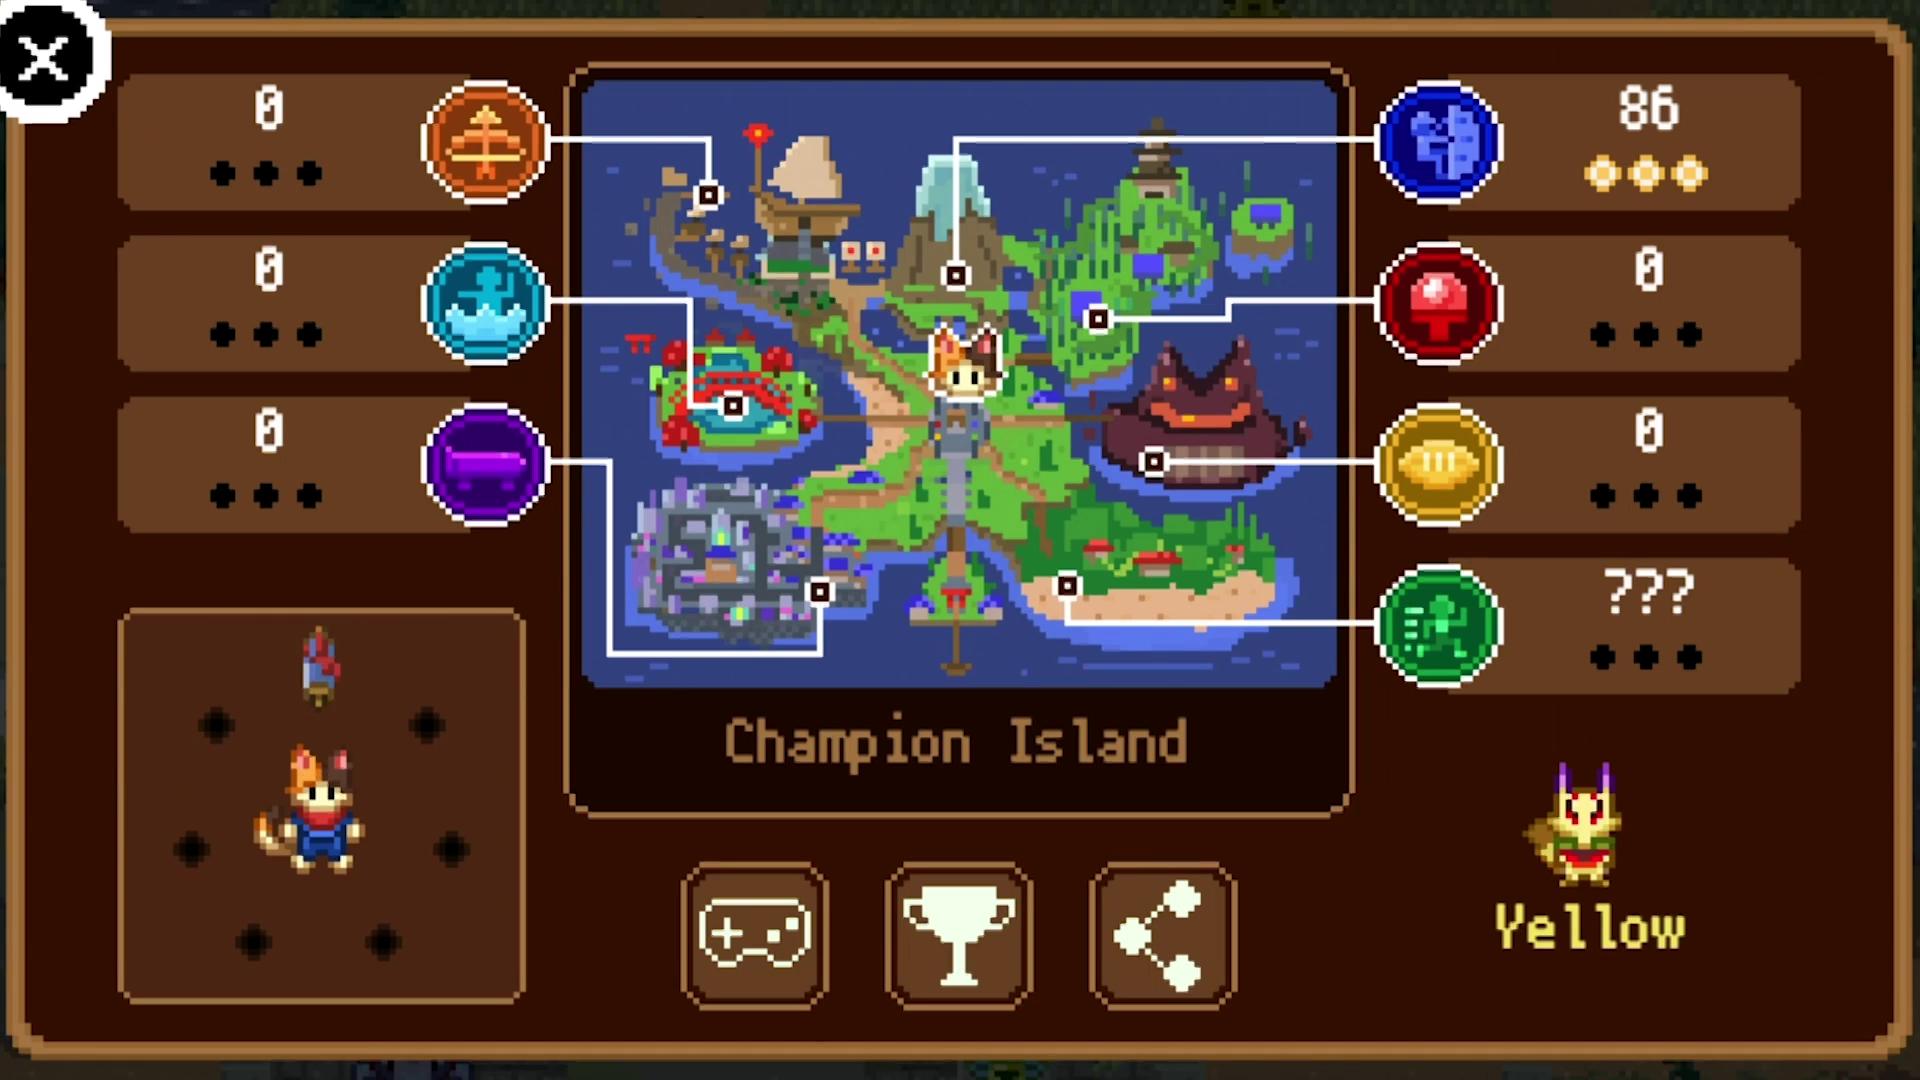 Champion Island Map (Source: 9to5google.com)